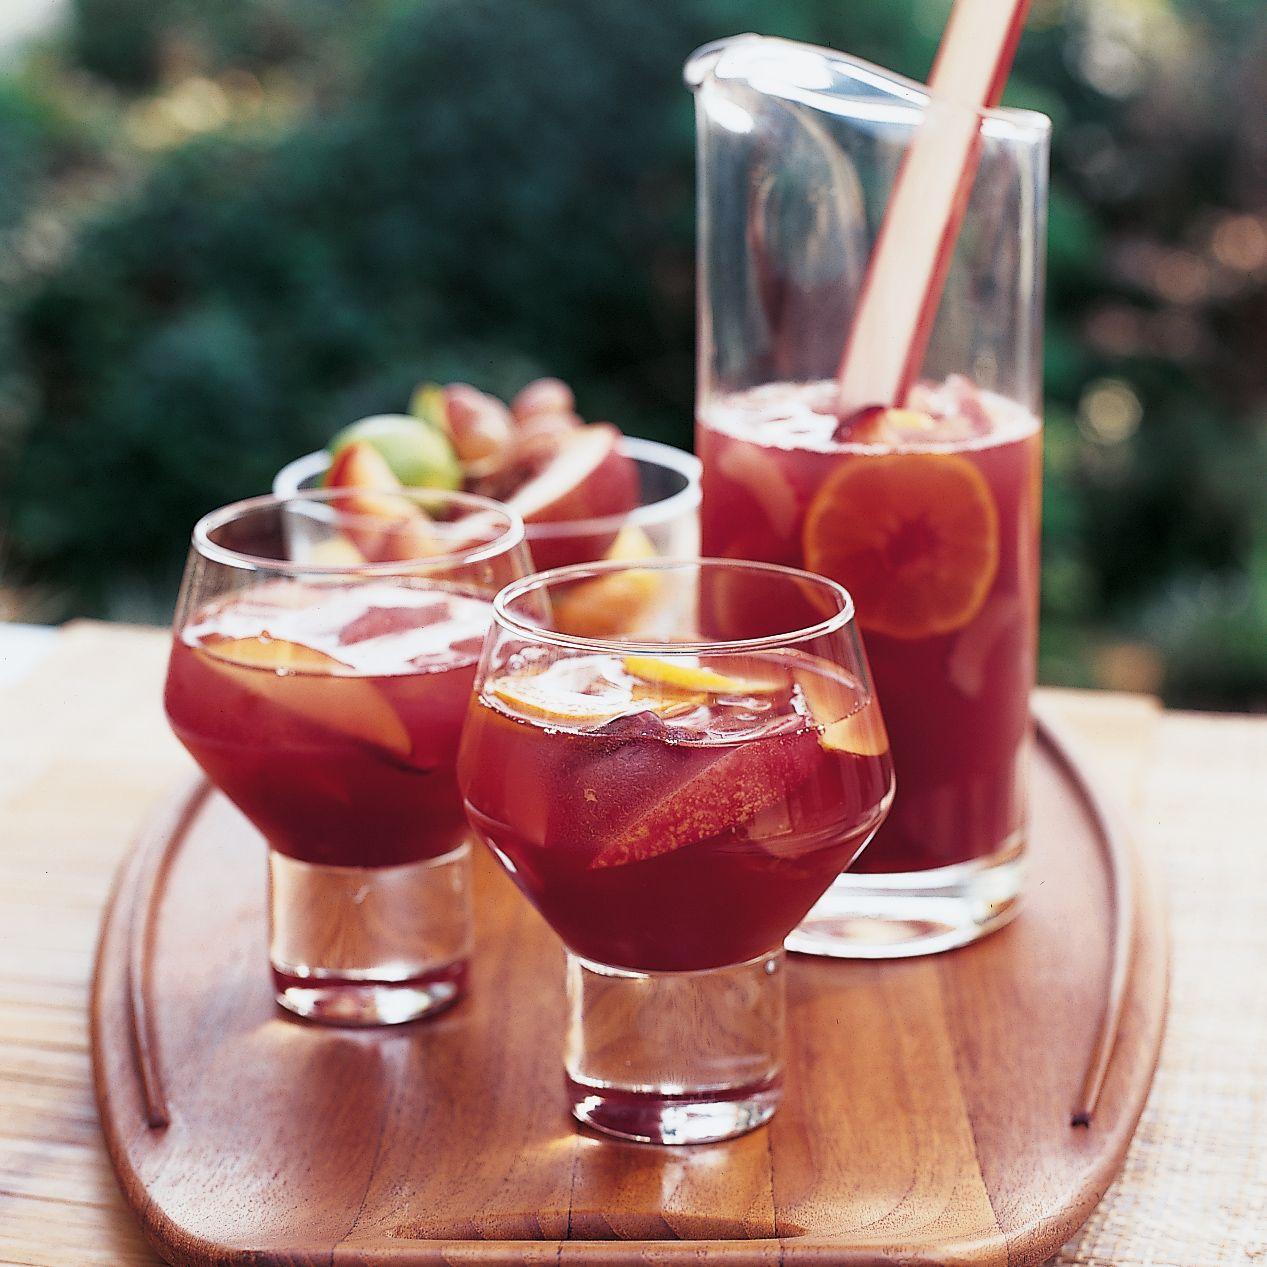 Tabla S Tart And Fruity Sangria Drankjes Drank